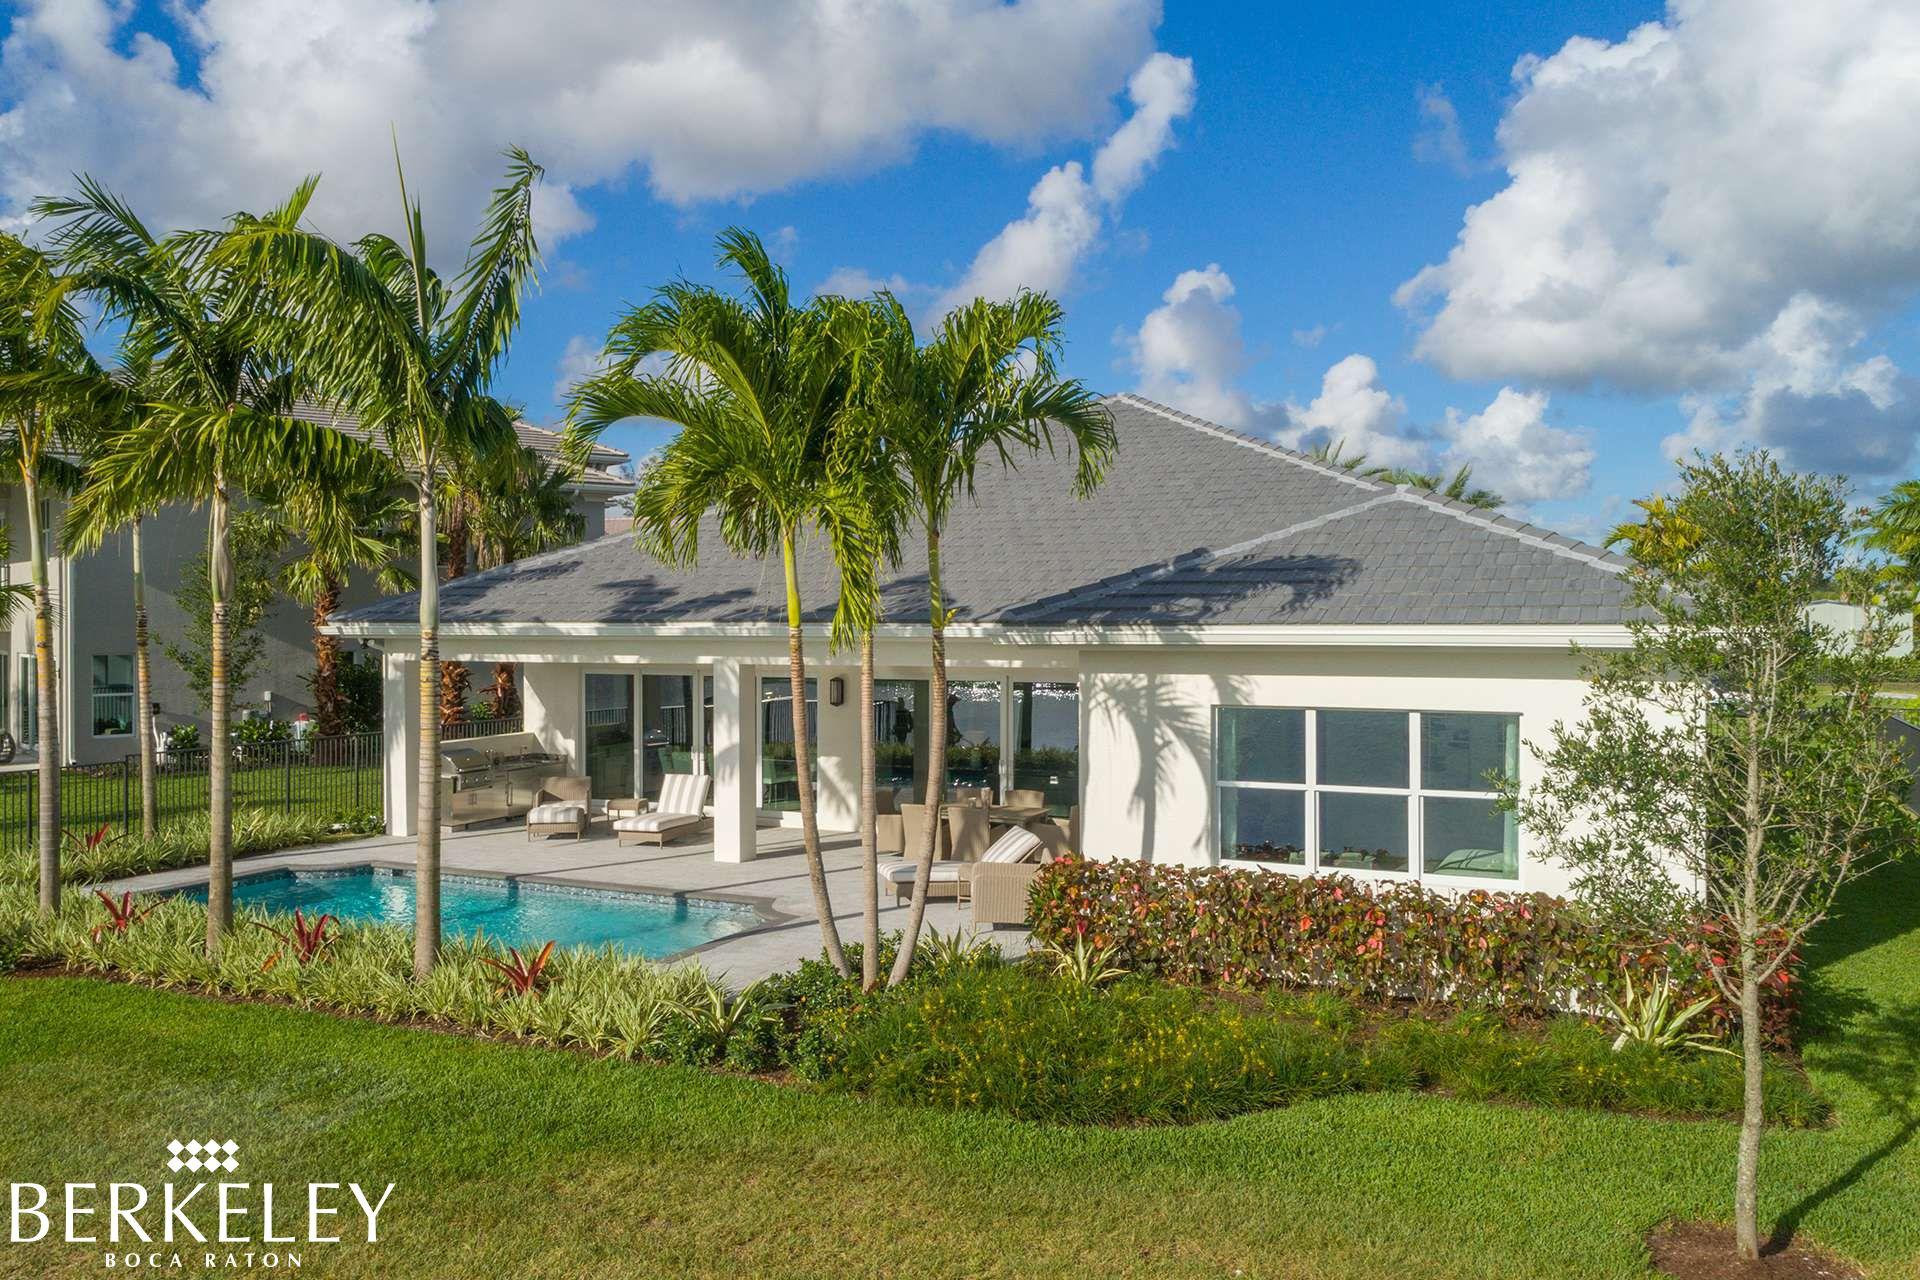 Luxury Homes In Boca Raton Berkeley In Boca Raton Florida Real Estate Gl Homes Florida Real Estate Florida Homes For Sale Malibu Homes